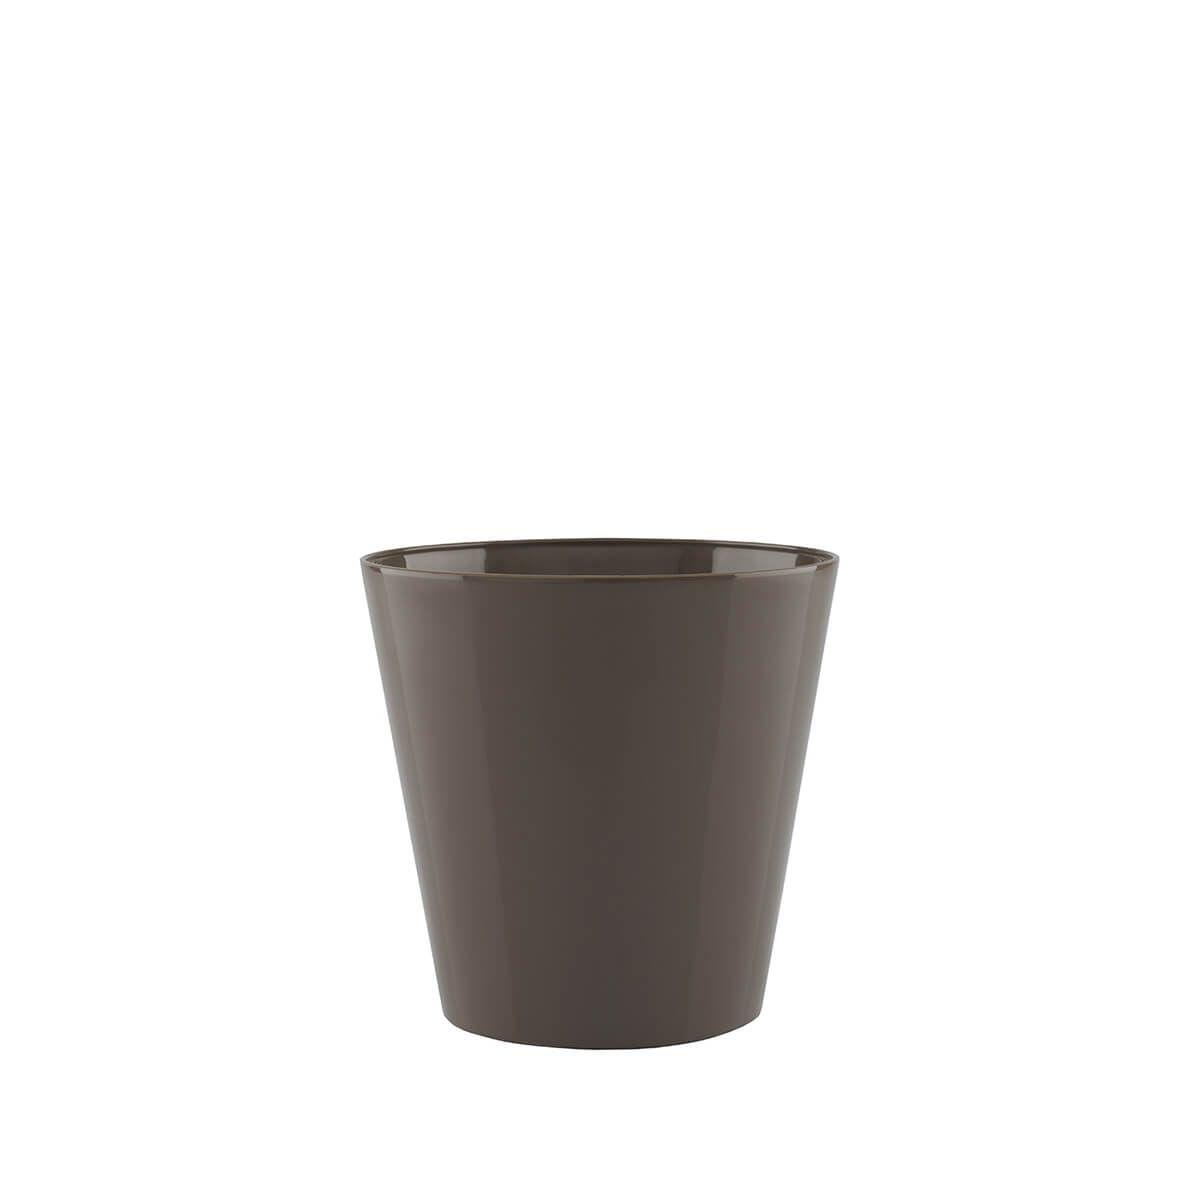 Vaso Porto 14 x 12 cm  Vasart